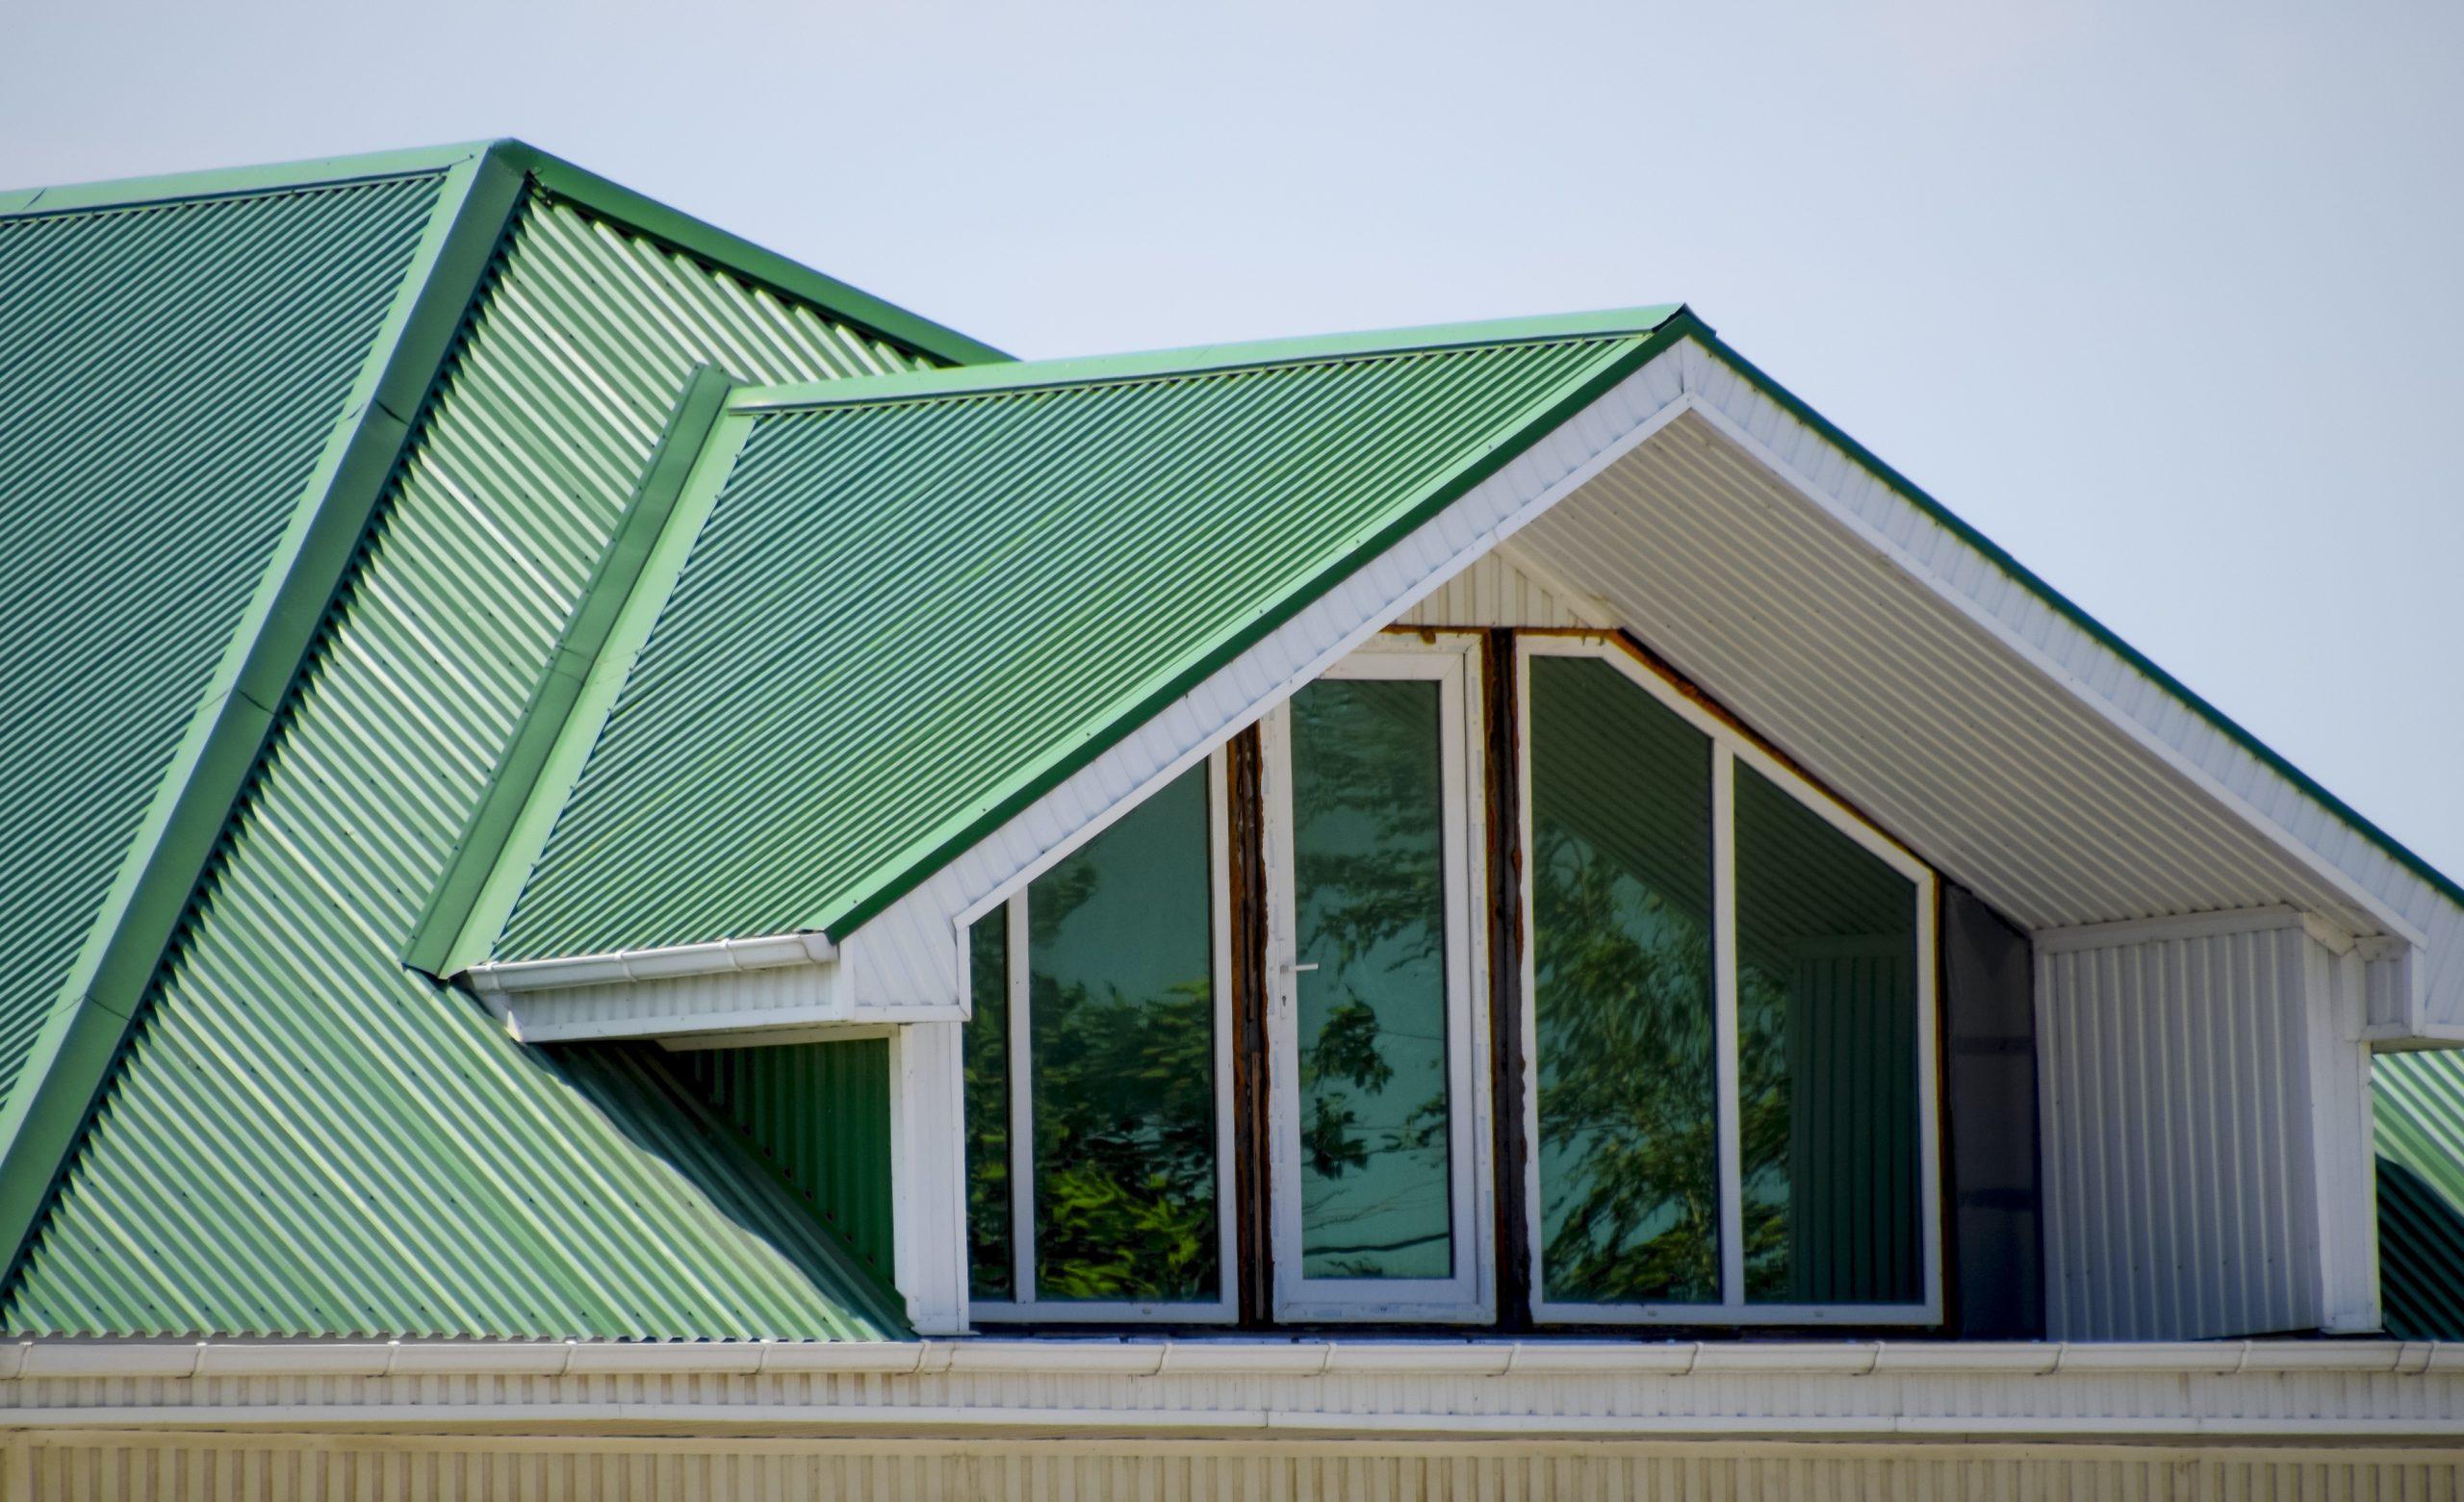 Topeka Metal Roofing, Topeka Kansas Topeka Metal Roofing, Aluminum Metal Roofing